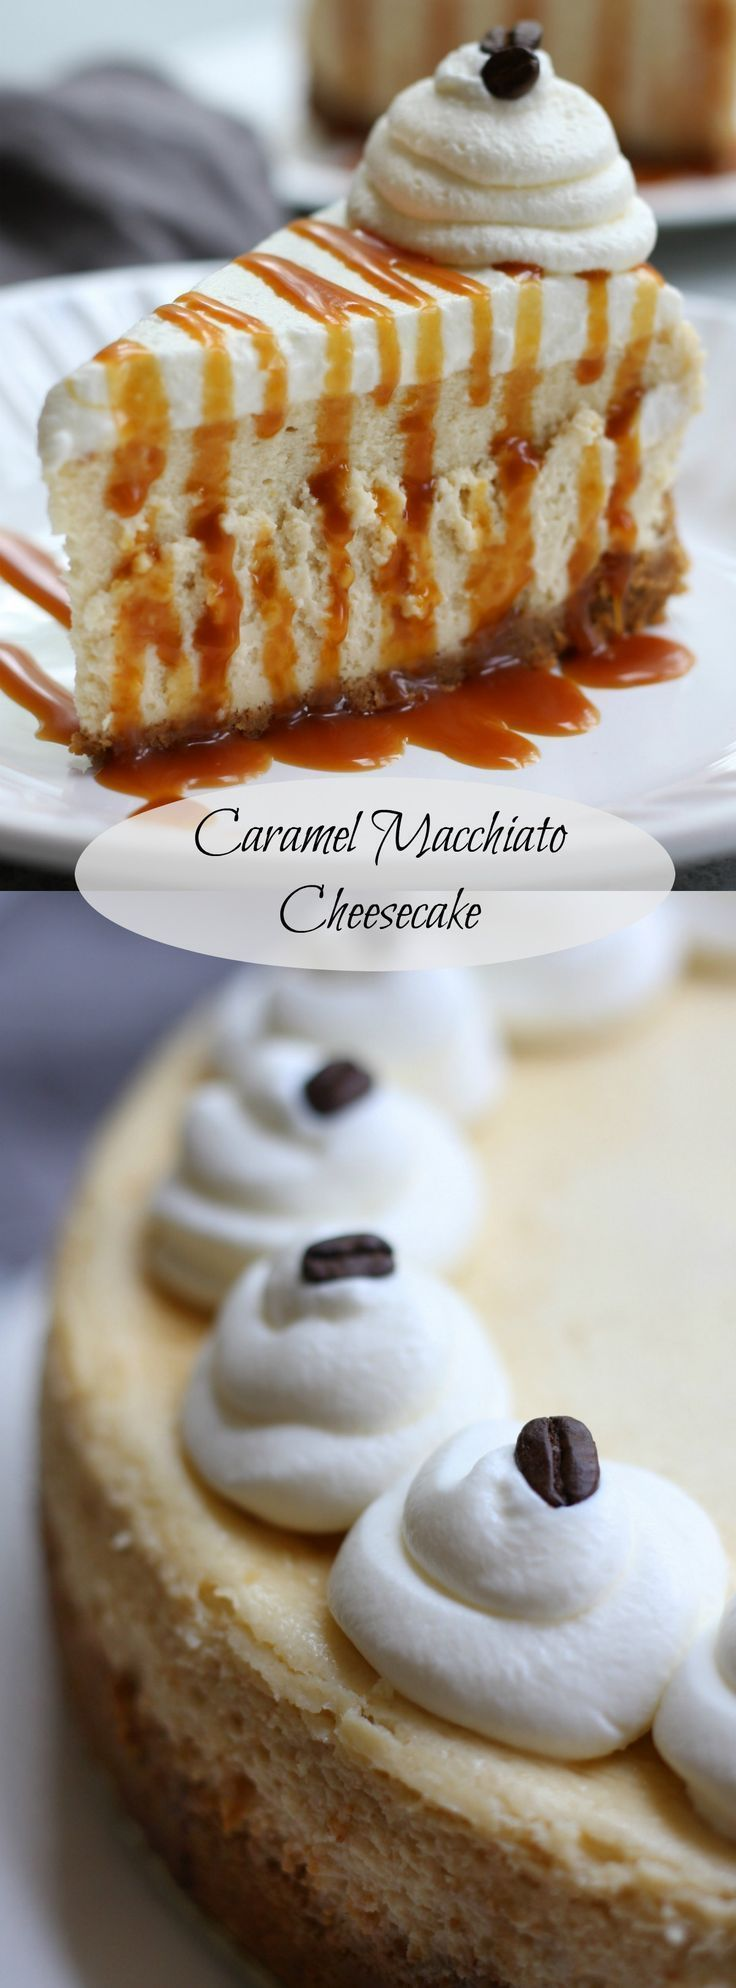 Caramel Macchiato Cheesecake recipe creates a silky